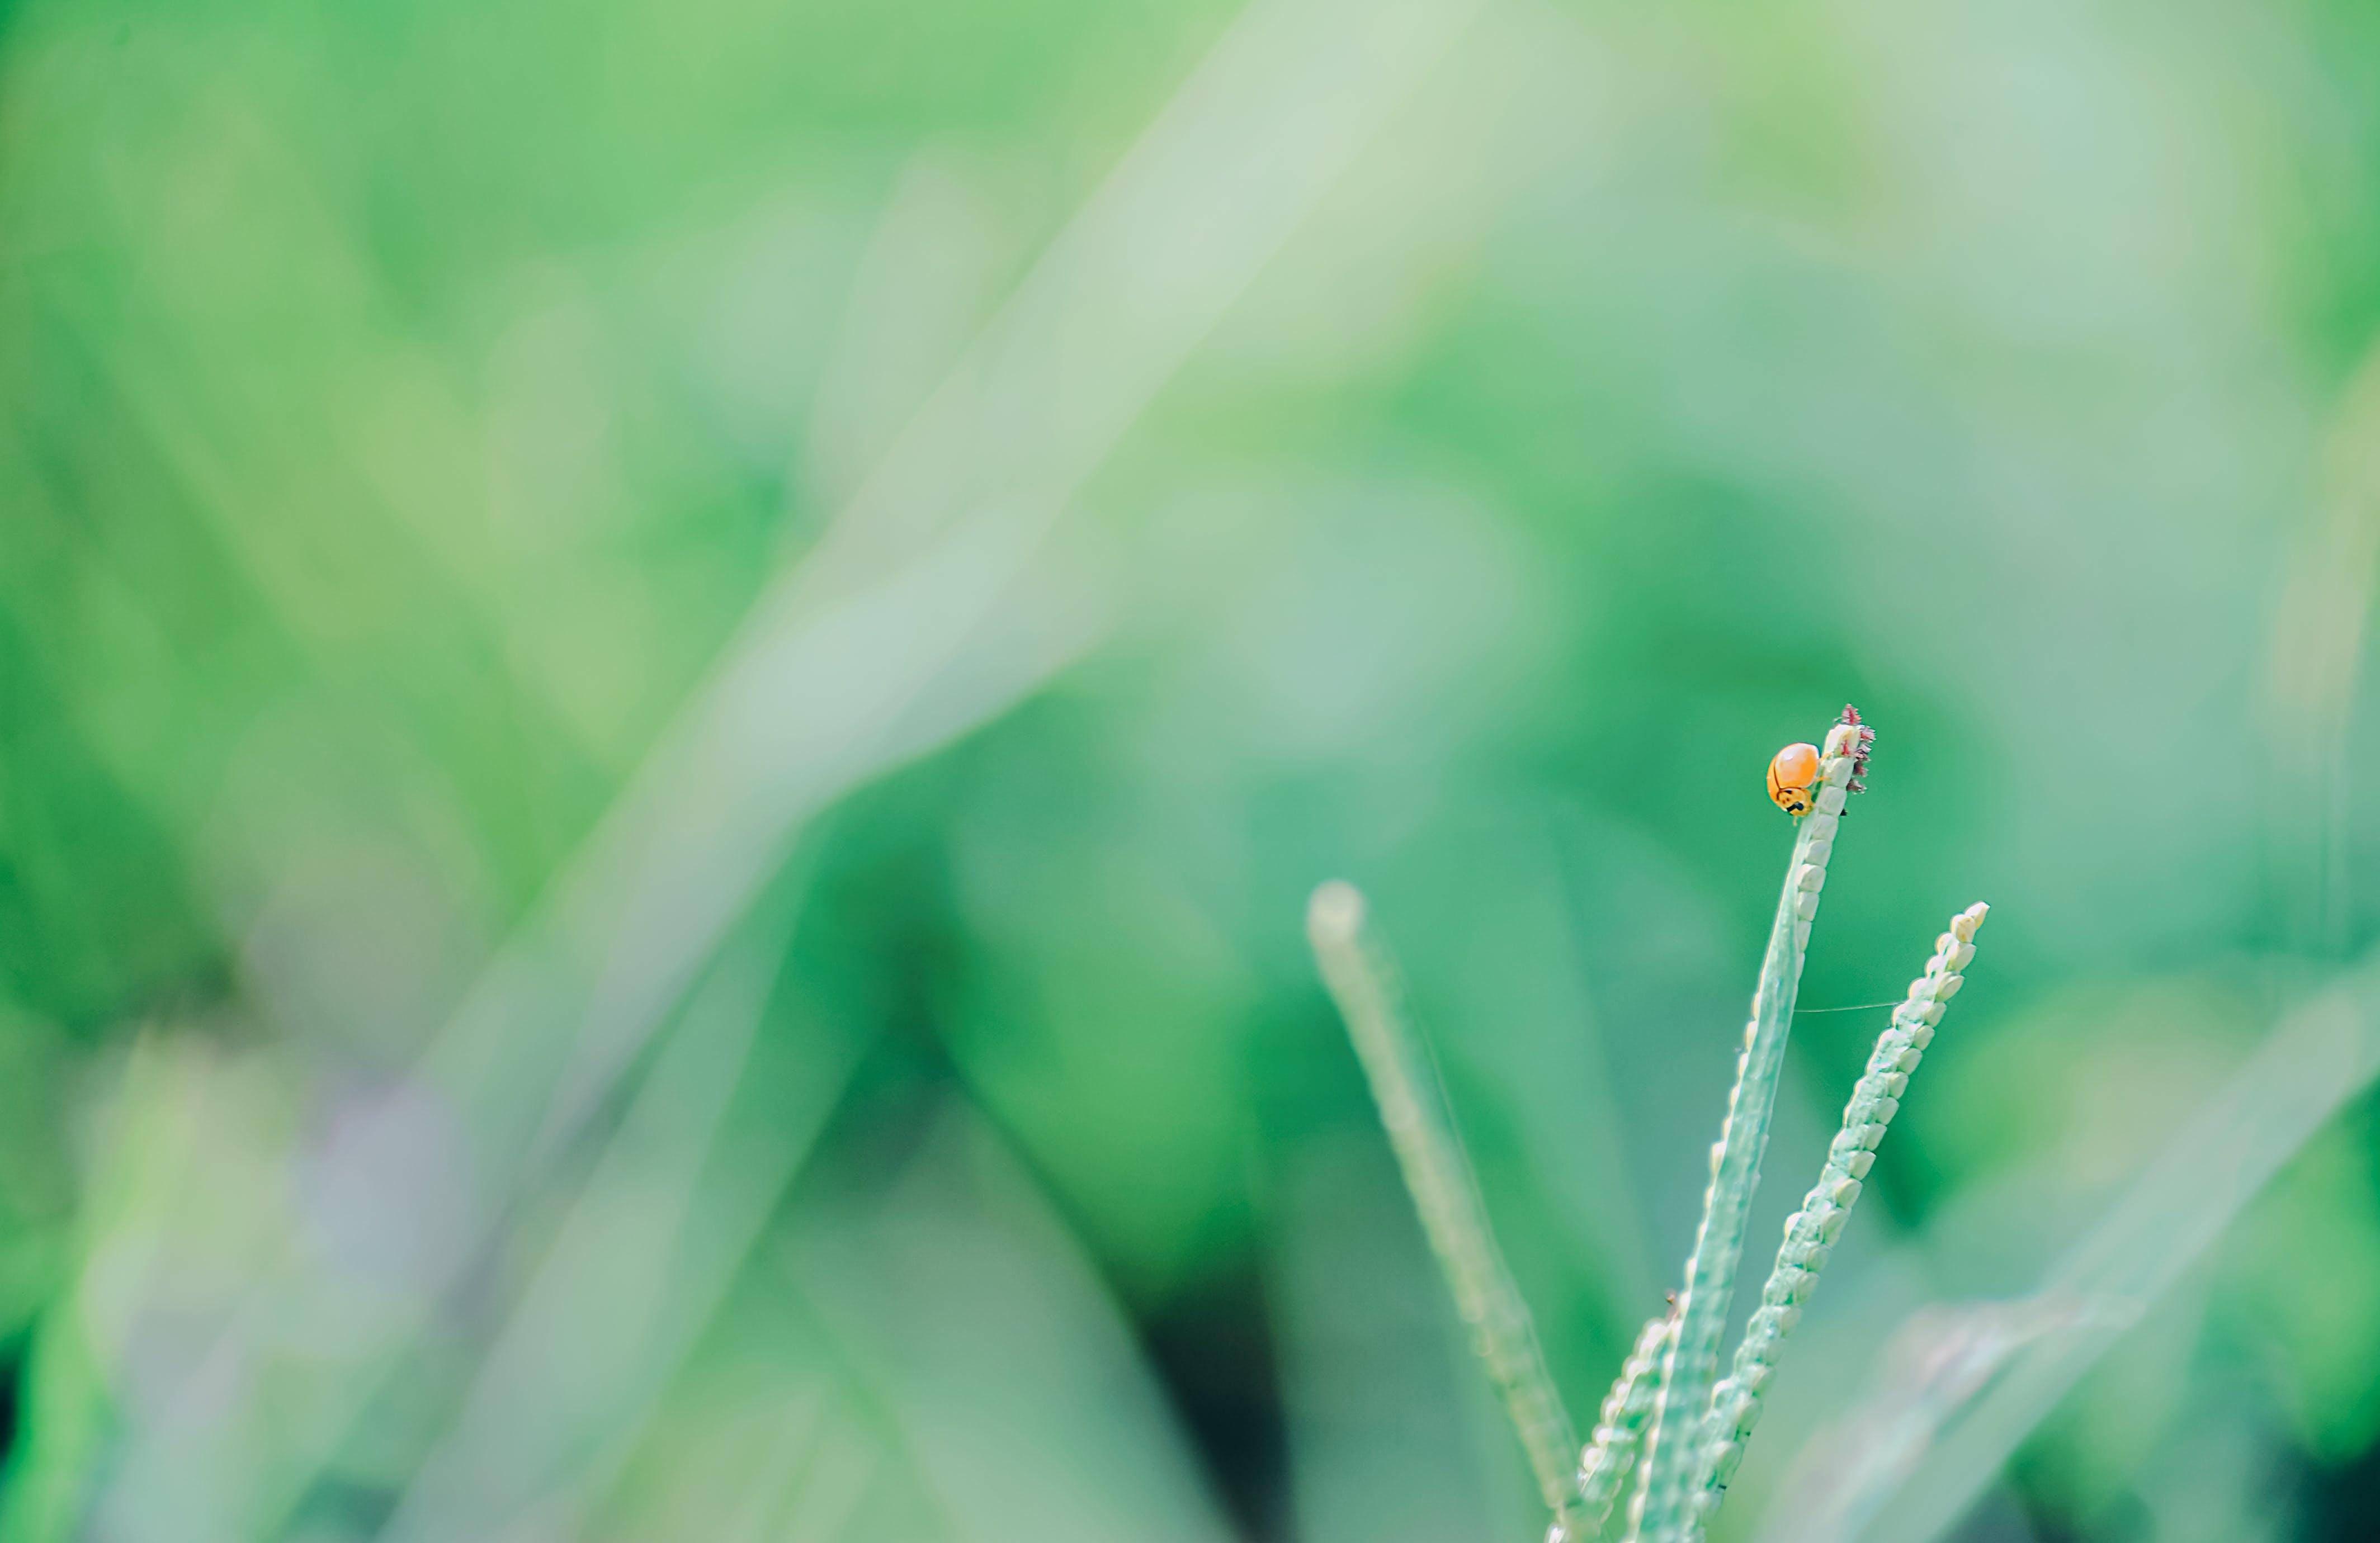 Selective Focus Photography Of Yellow Ladybug On Green Grass